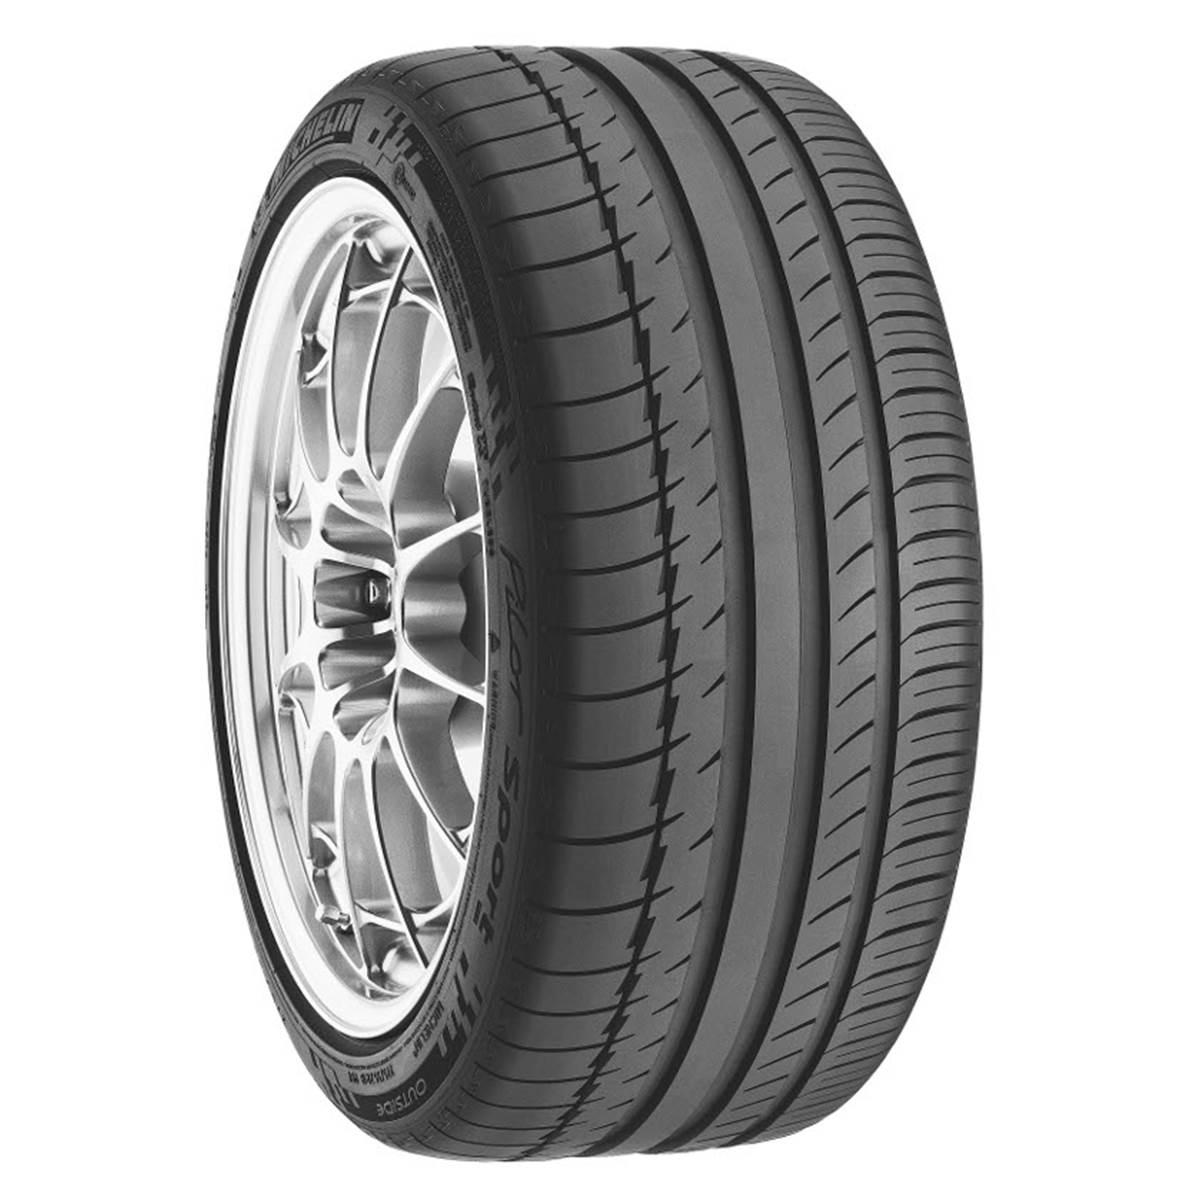 Pneu Michelin 335/35R17 106Y Pilot Sport Ps2